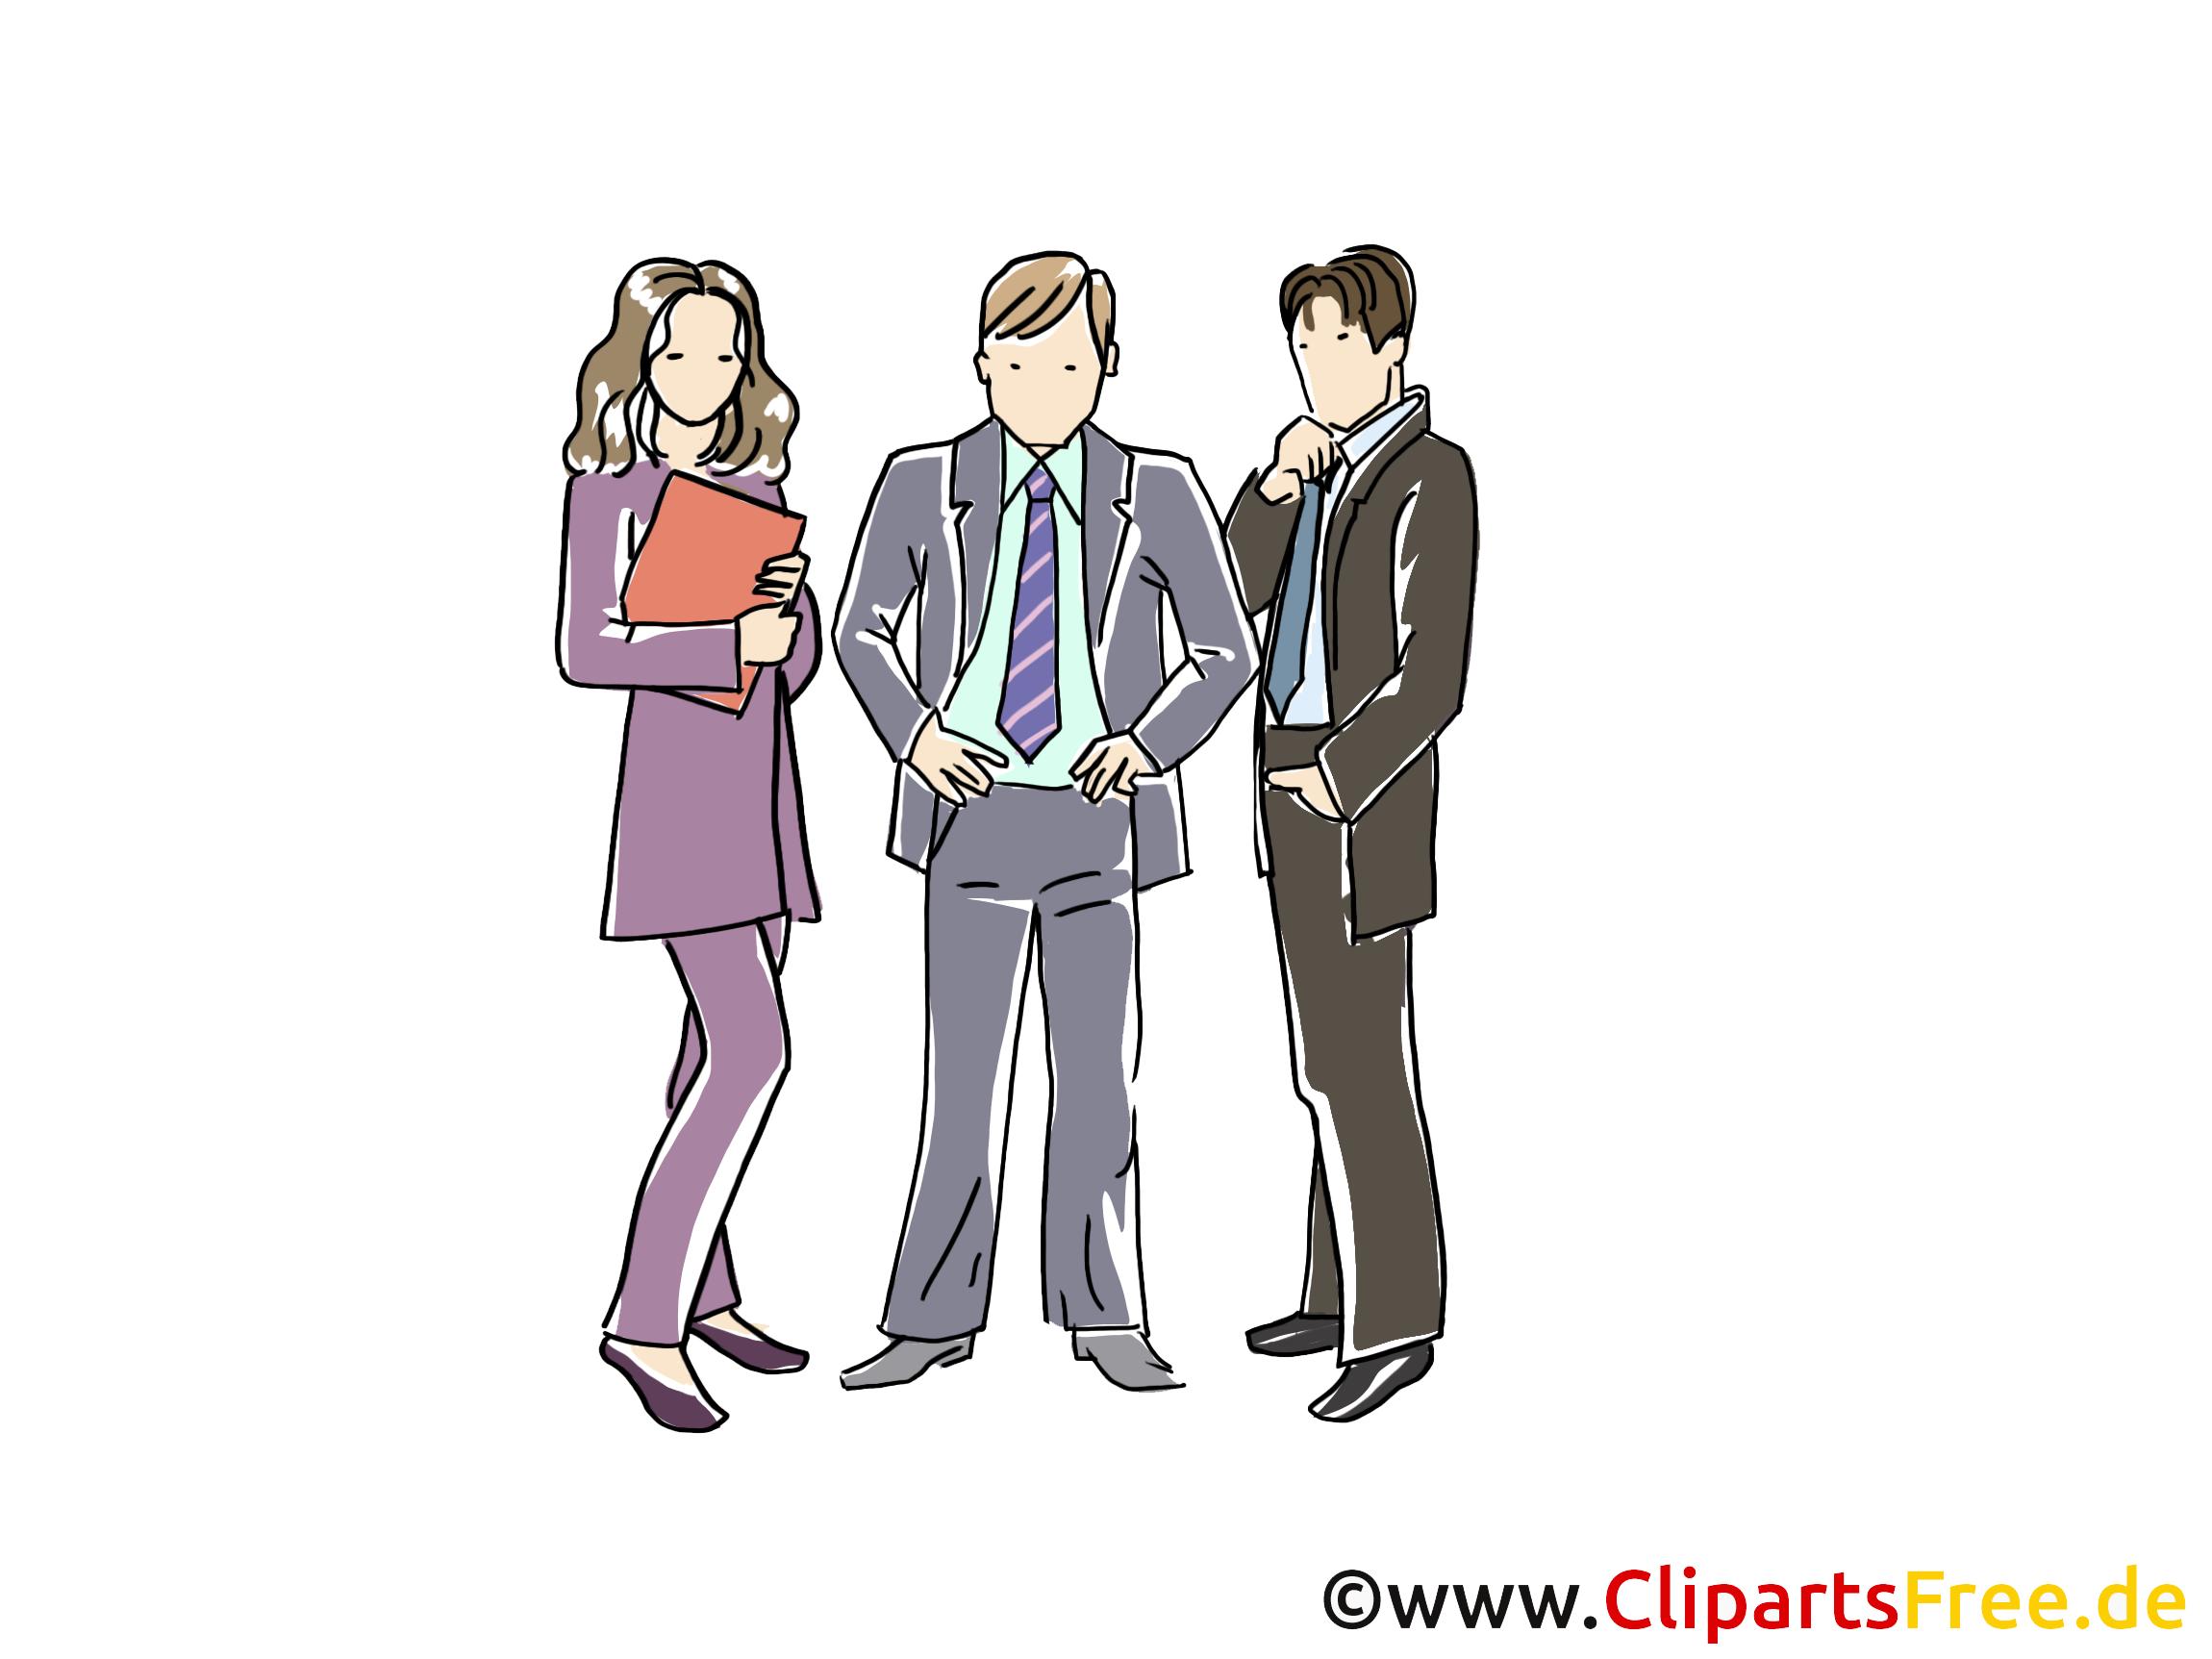 clipart kostenlos präsentation - photo #3